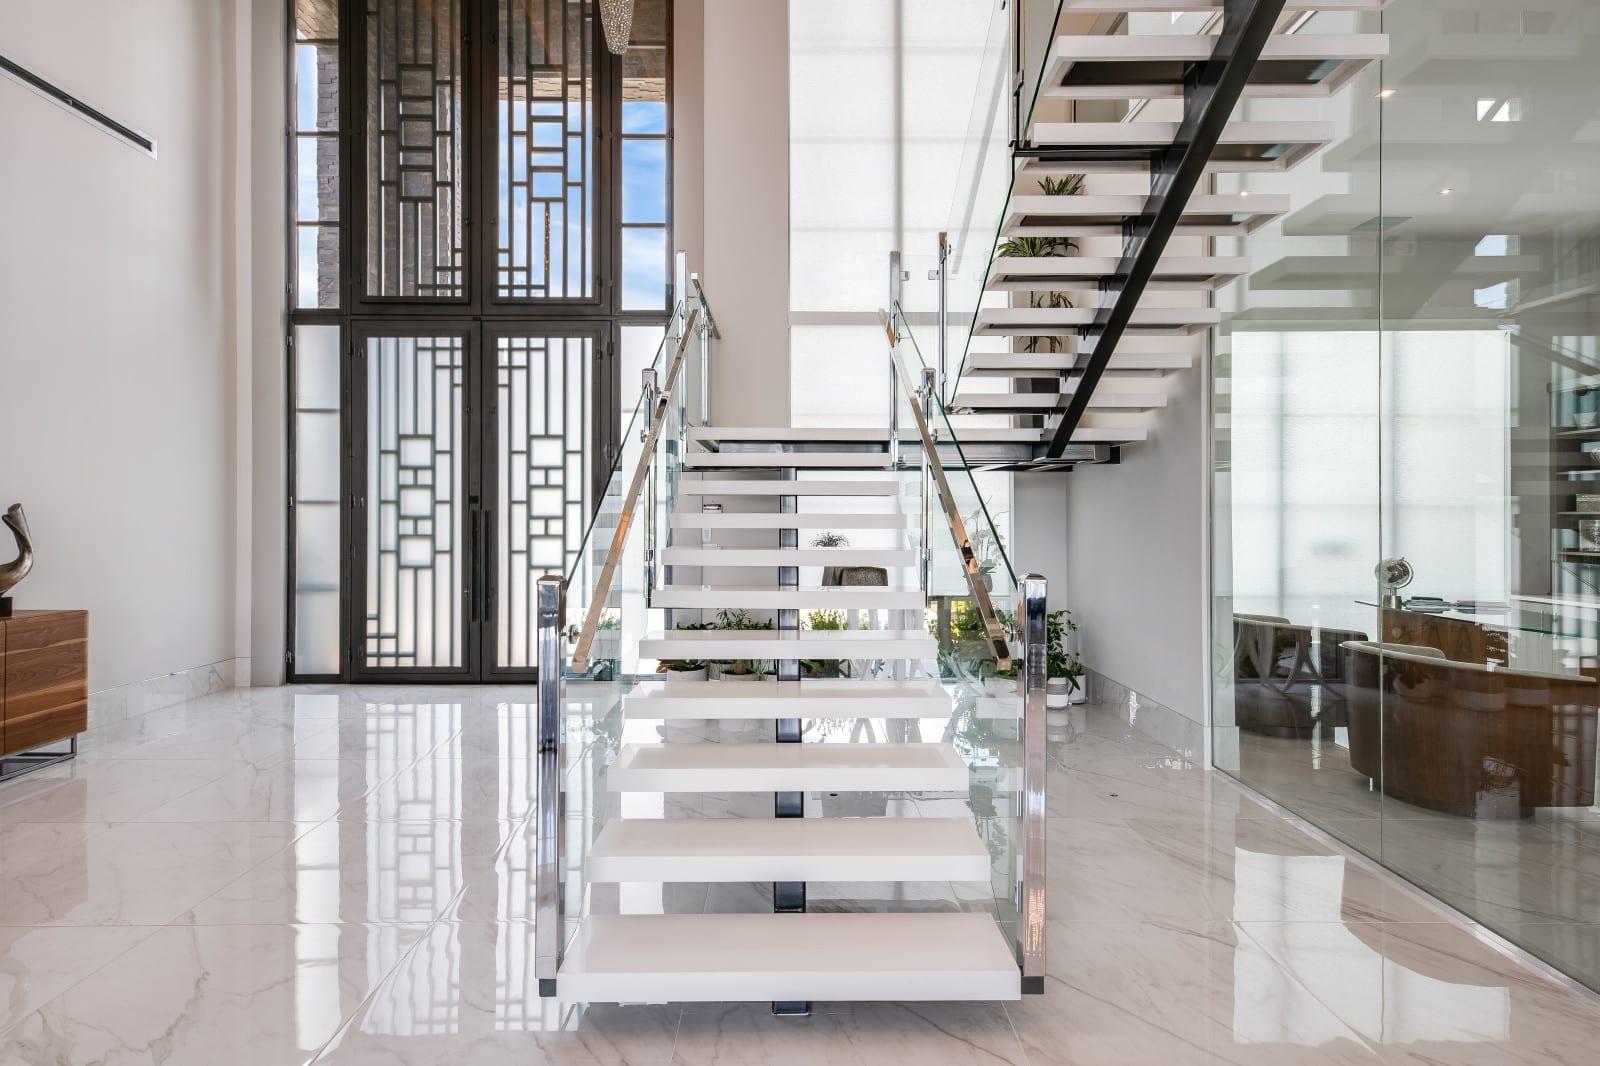 Custom Home Build and Interior Design # 29 - Millennial Design + Build, Home Builders in Dallas Texas, modern style homes, and custom home builders in DFW